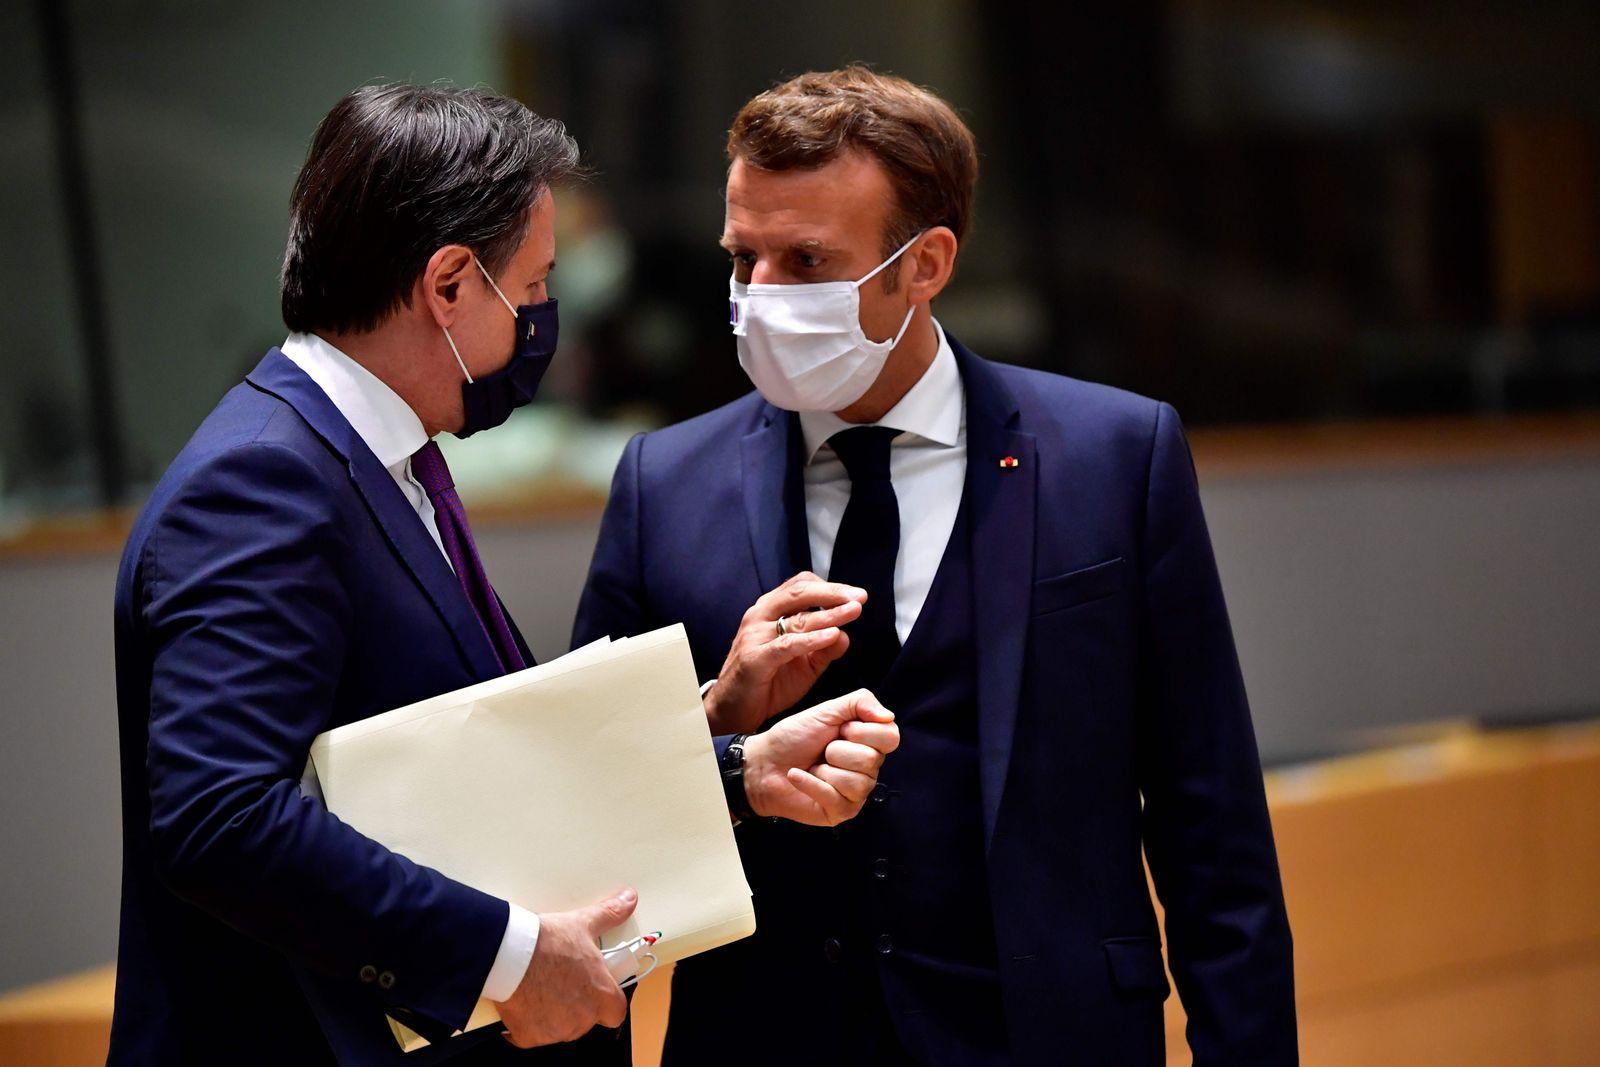 BELGIUM-EU-SUMMIT-HEALTH-VIRUS